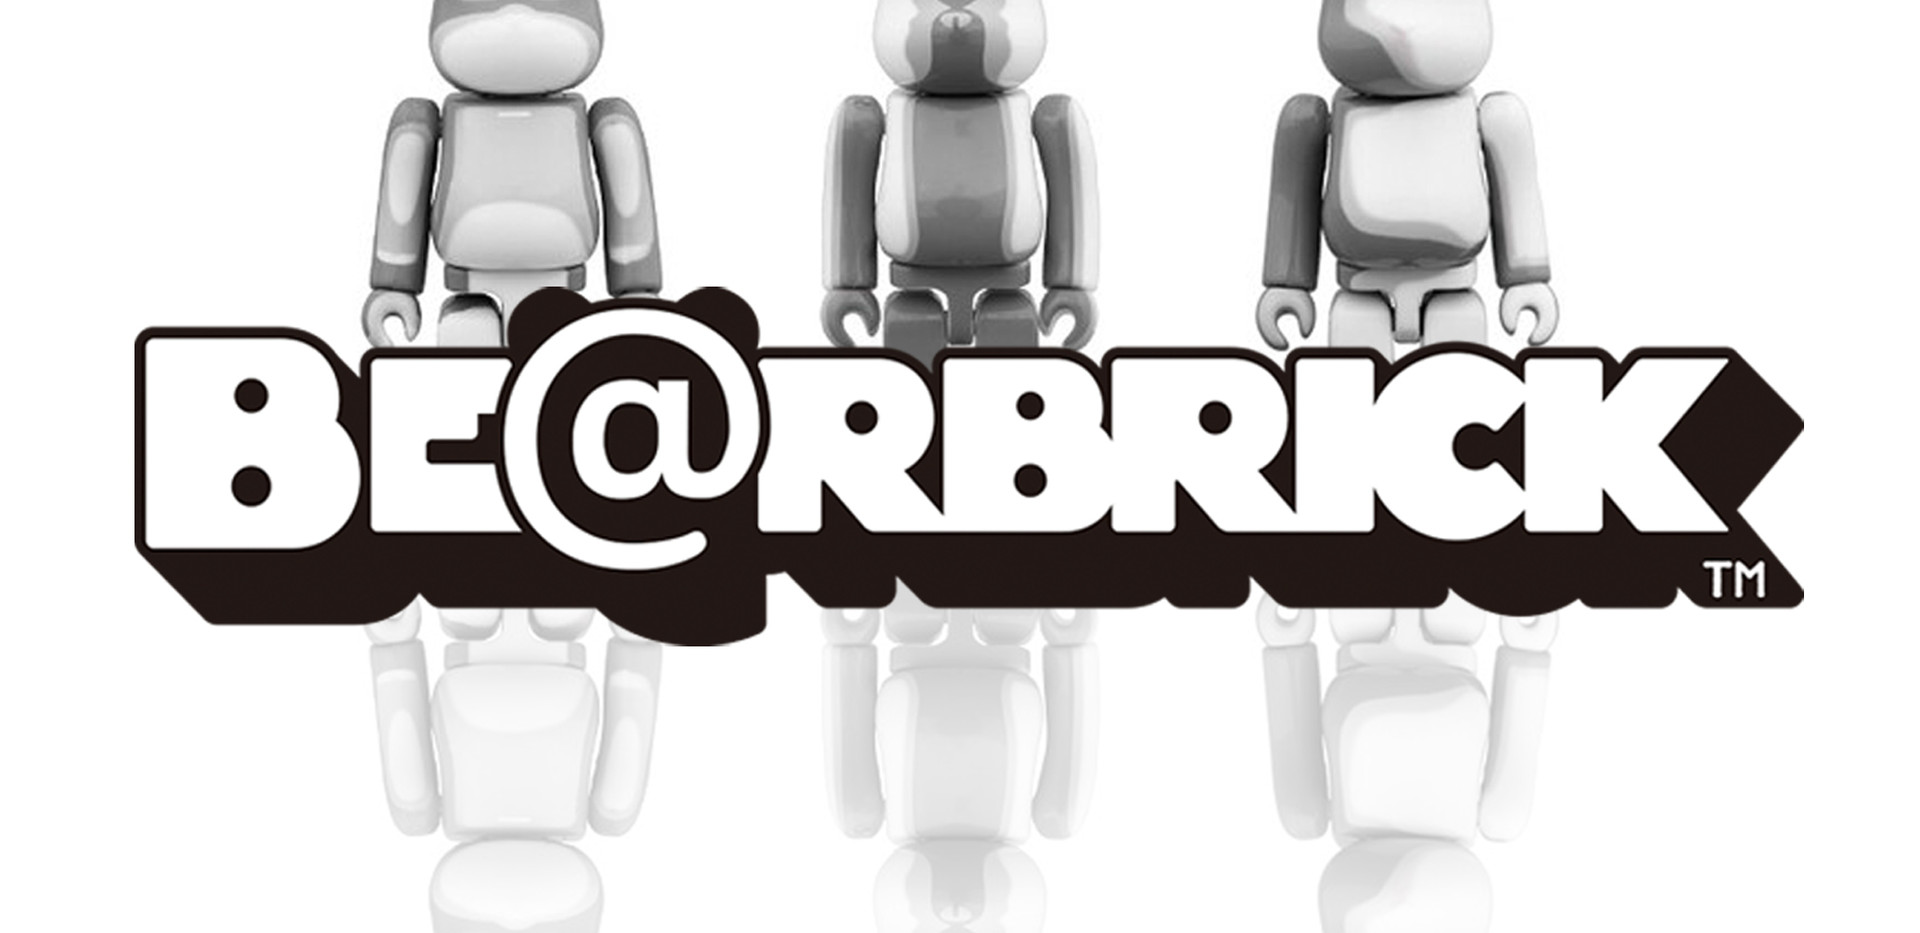 bearbrick_brand_ls-02.jpg